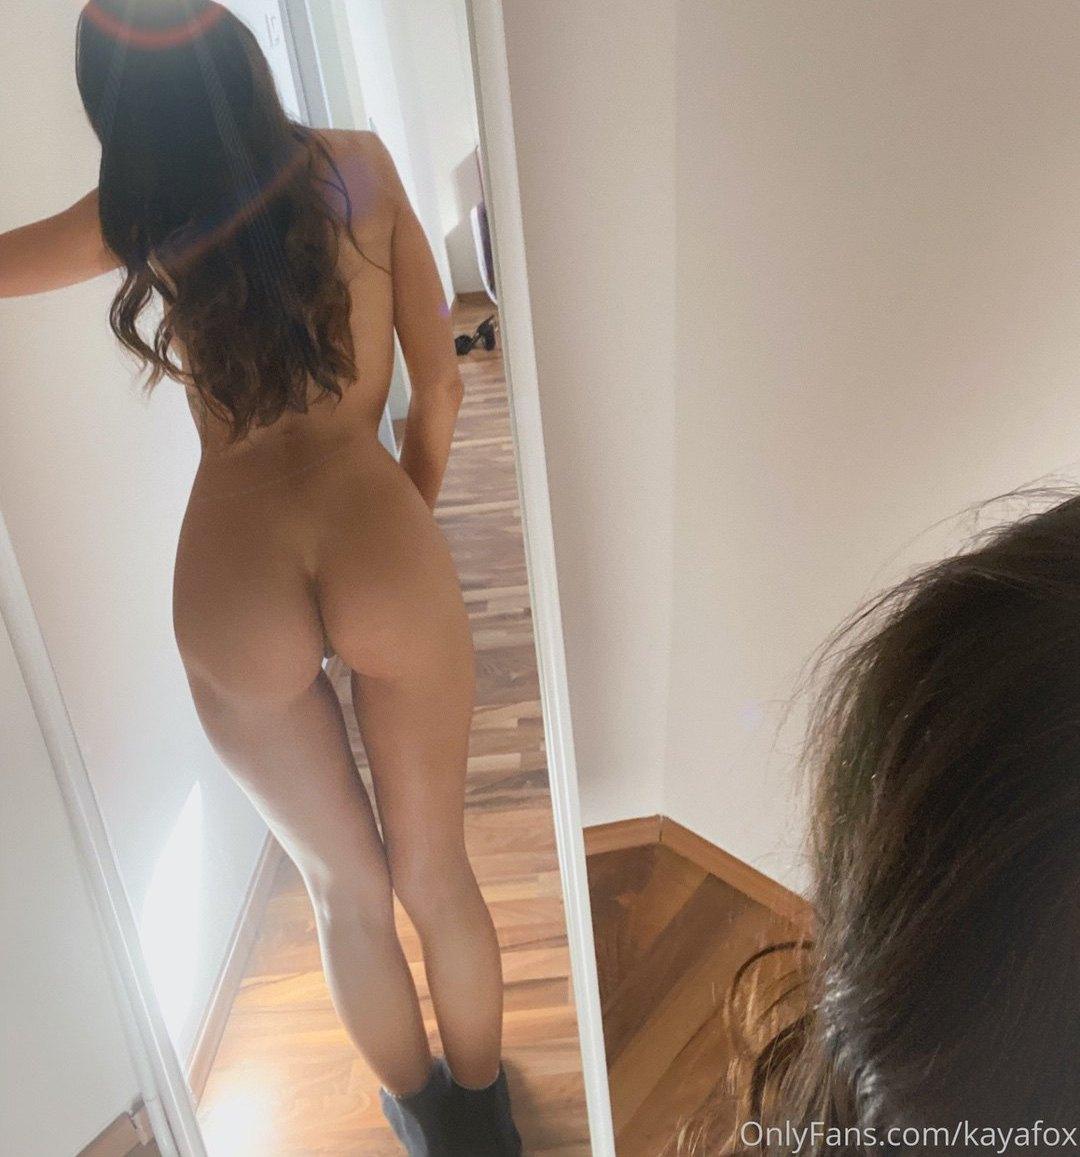 Kaya Fox Kayafox Onlyfans Nudes Leaks 0031